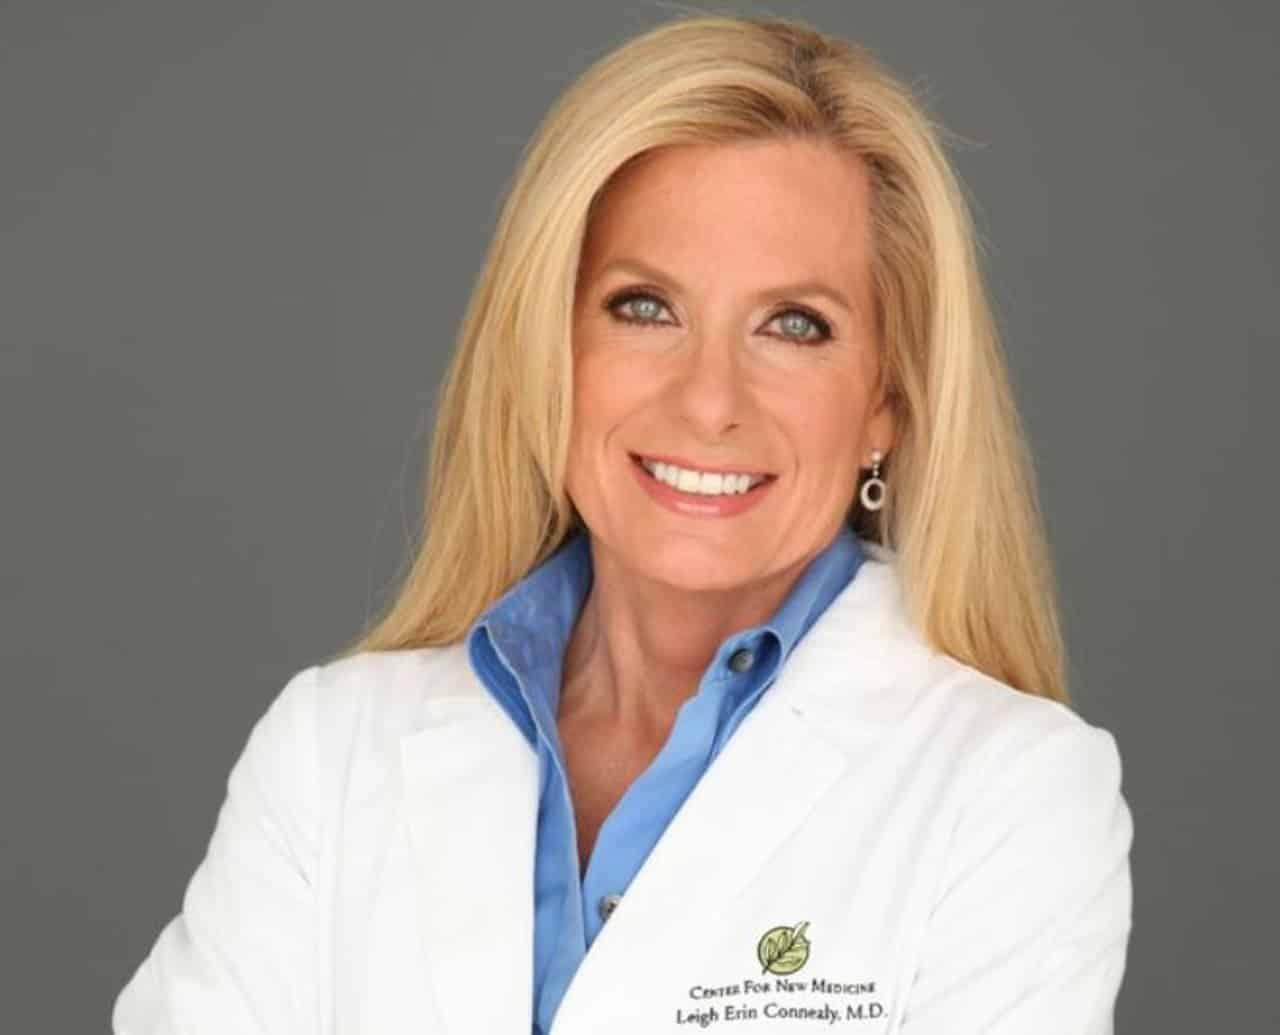 Dr. Leigh erin connealy center for new medicine